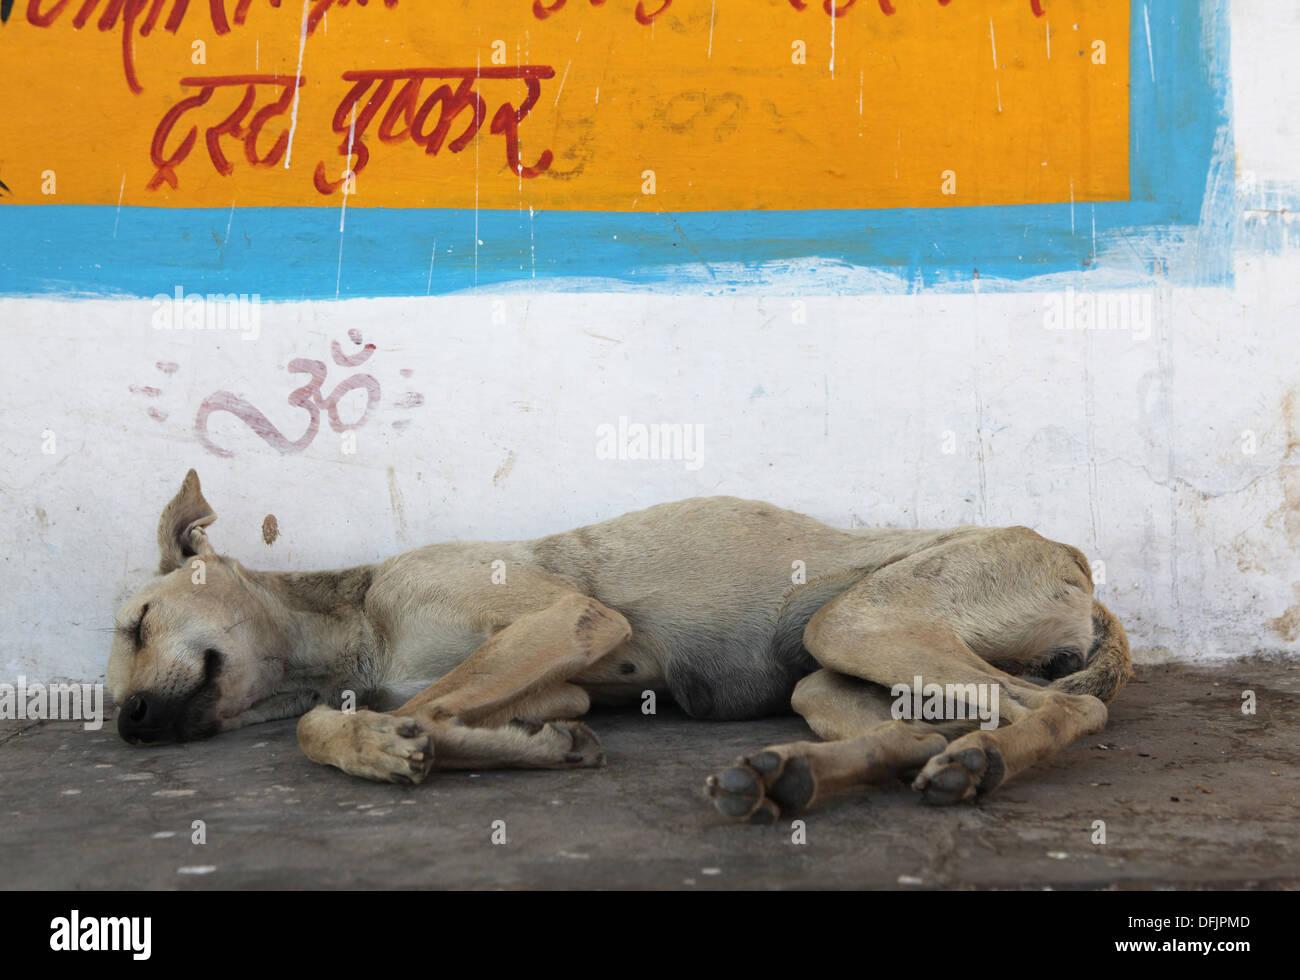 Dog sleeping on a sidewalk in Pushkar,Rajasthan,India. - Stock Image